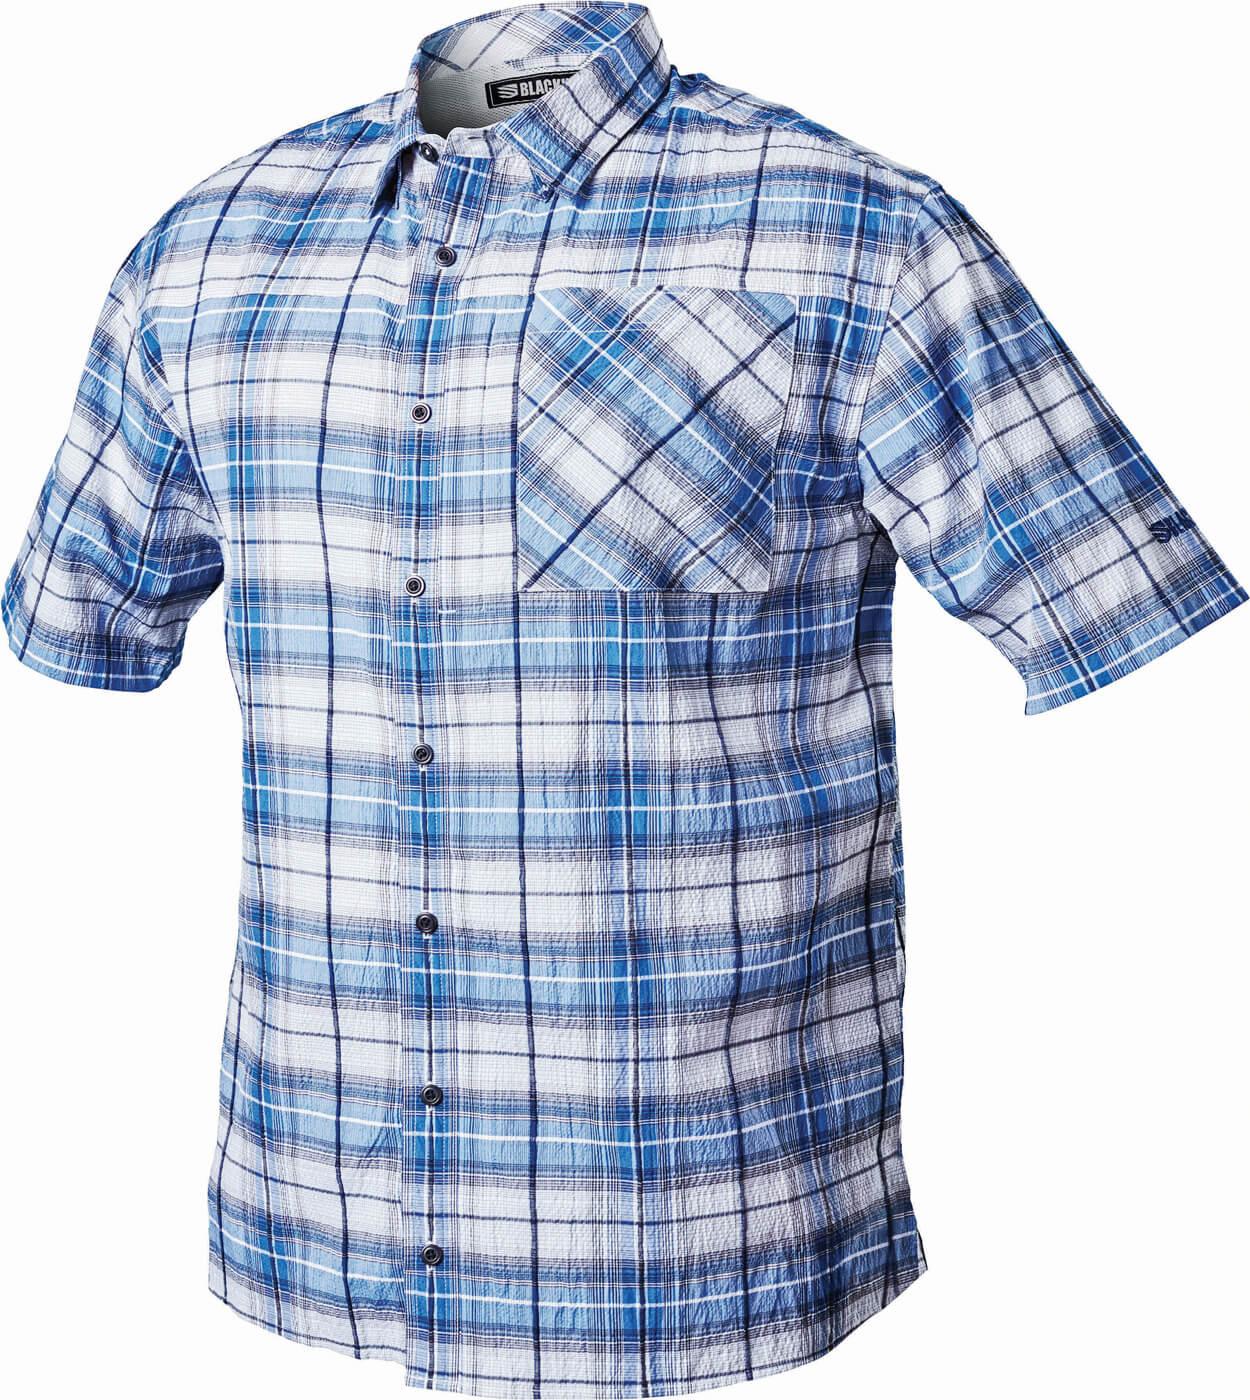 Blackhawk! 1700 shirt